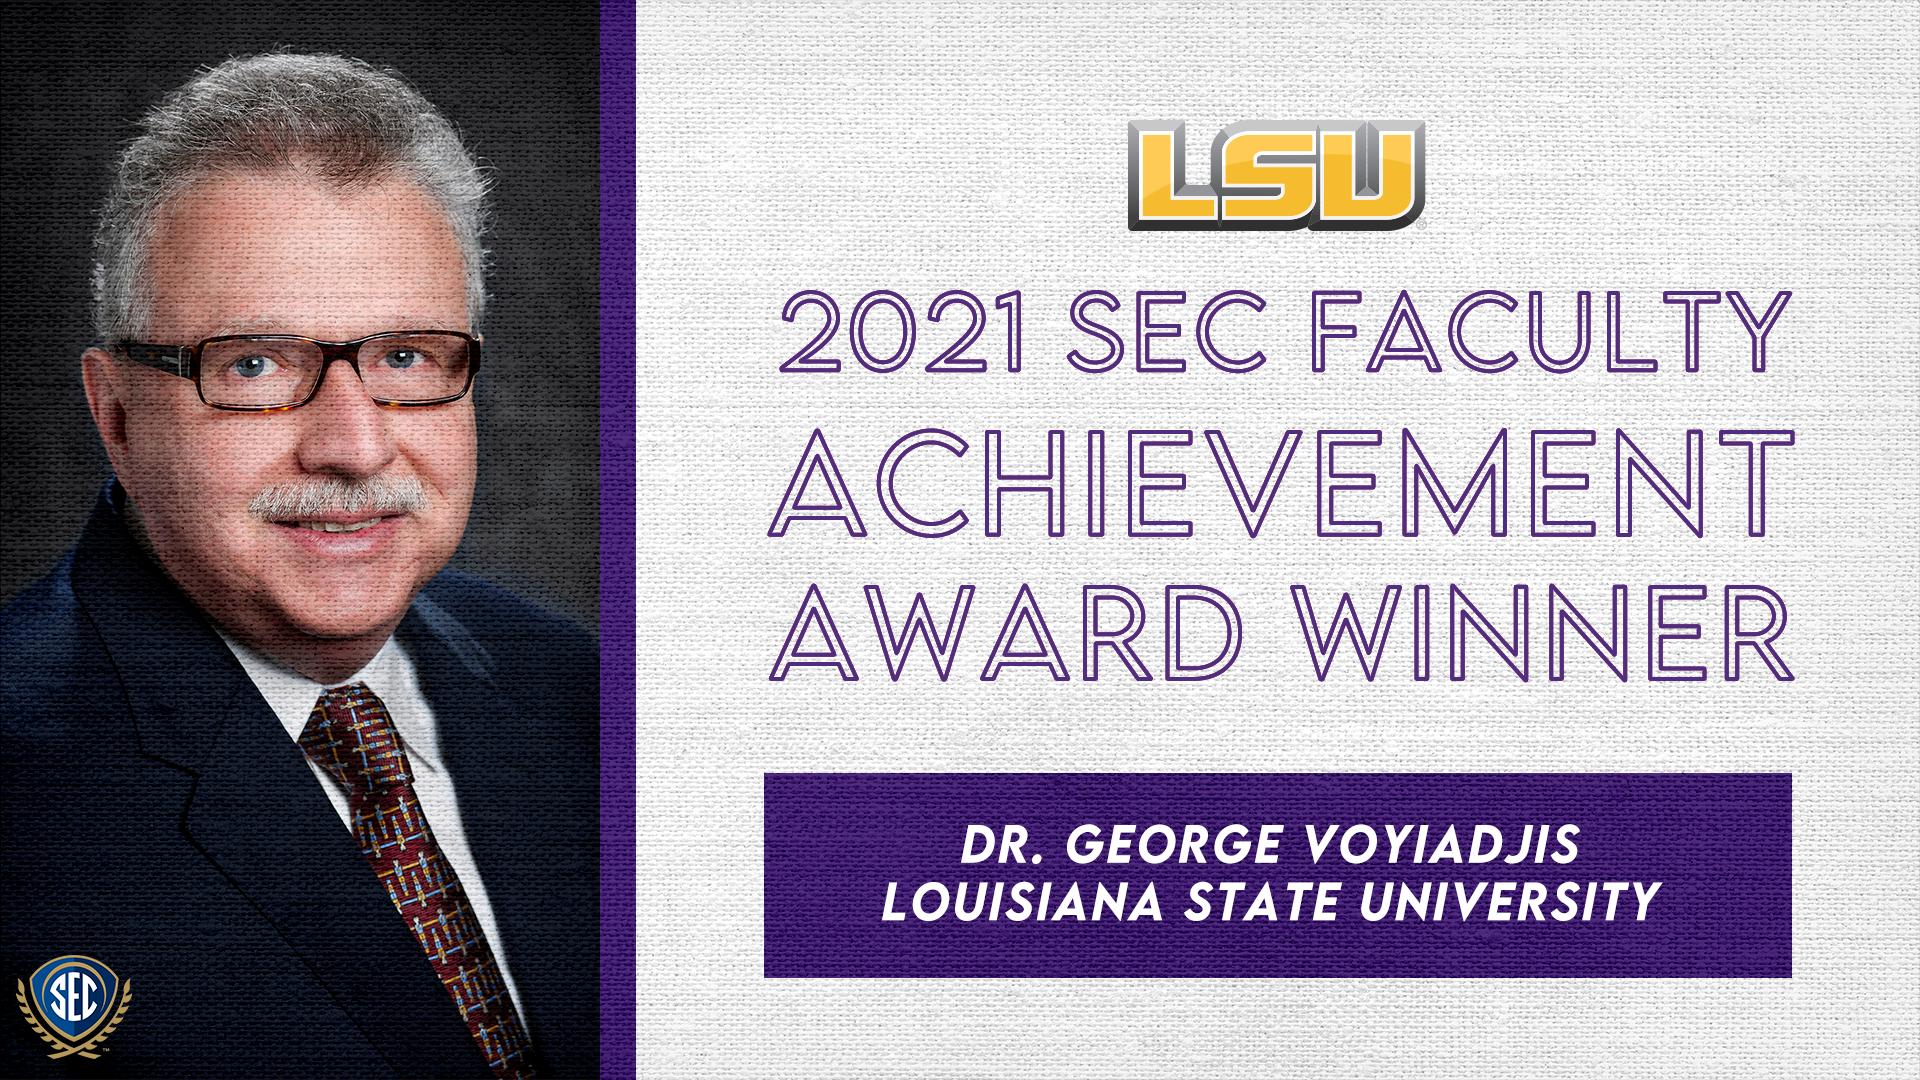 SEC Announces Dr. George Voyiadjis Wins 2021 Faculty Achievement Award for LSU